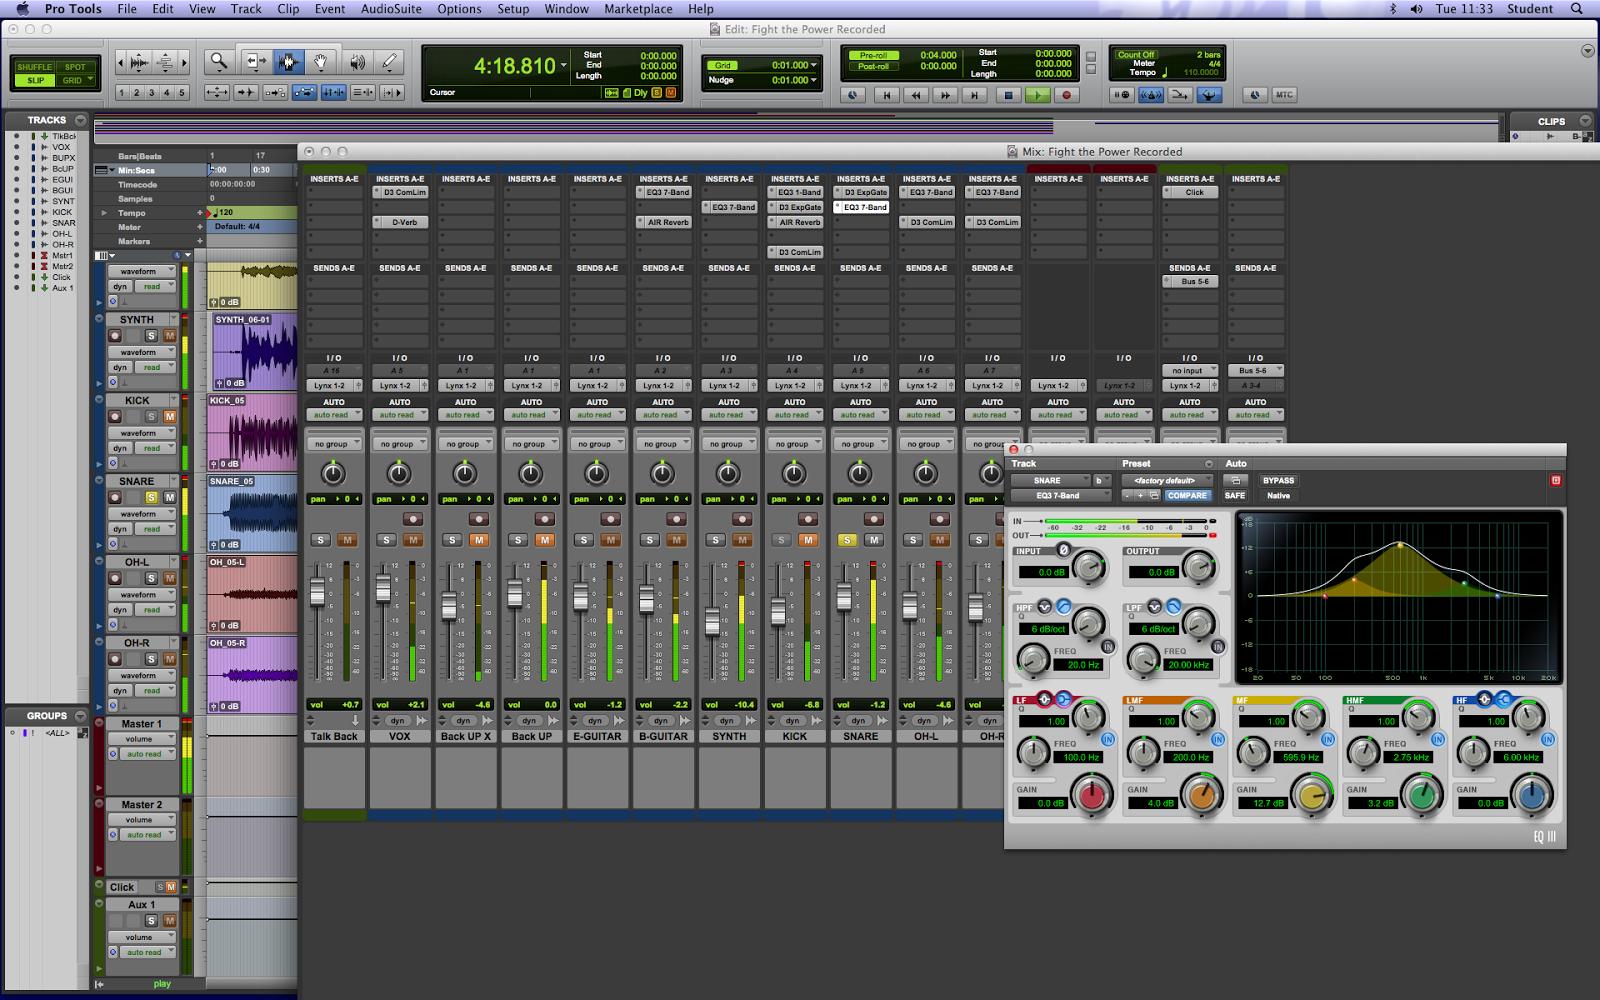 pro tools 11 free download